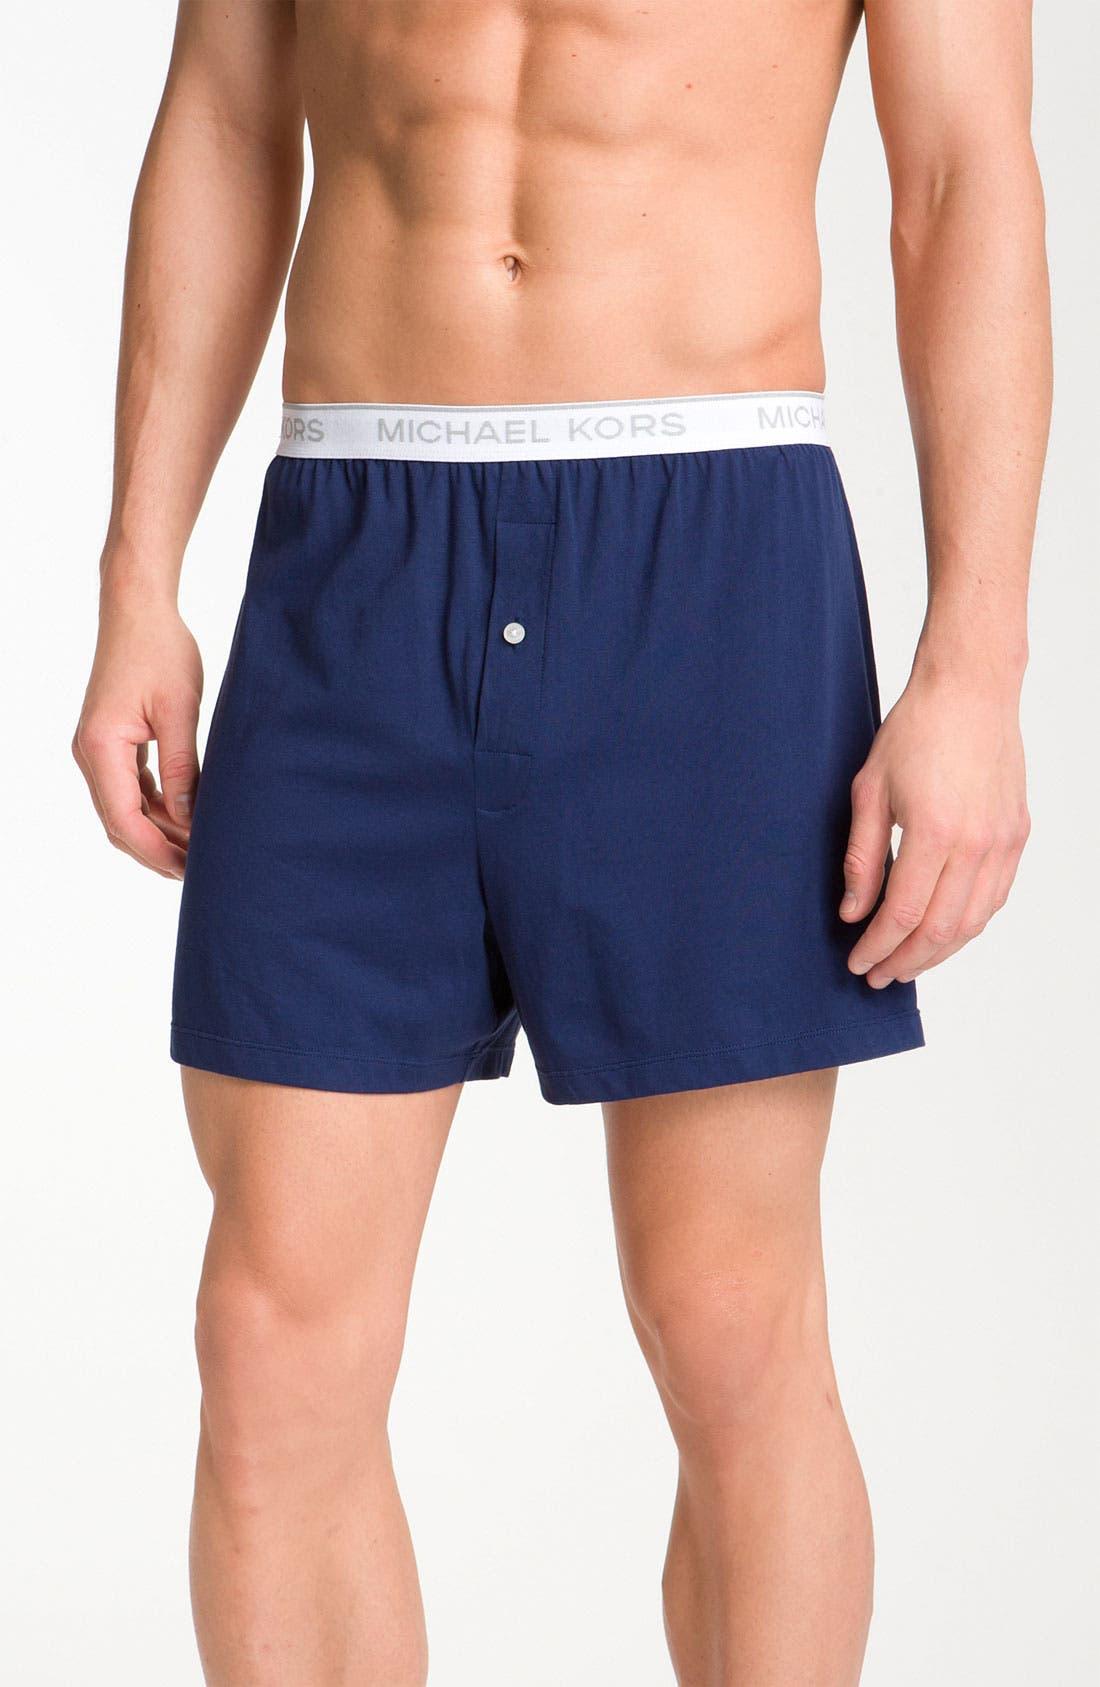 Alternate Image 1 Selected - Michael Kors Knit Boxers (2-Pack)